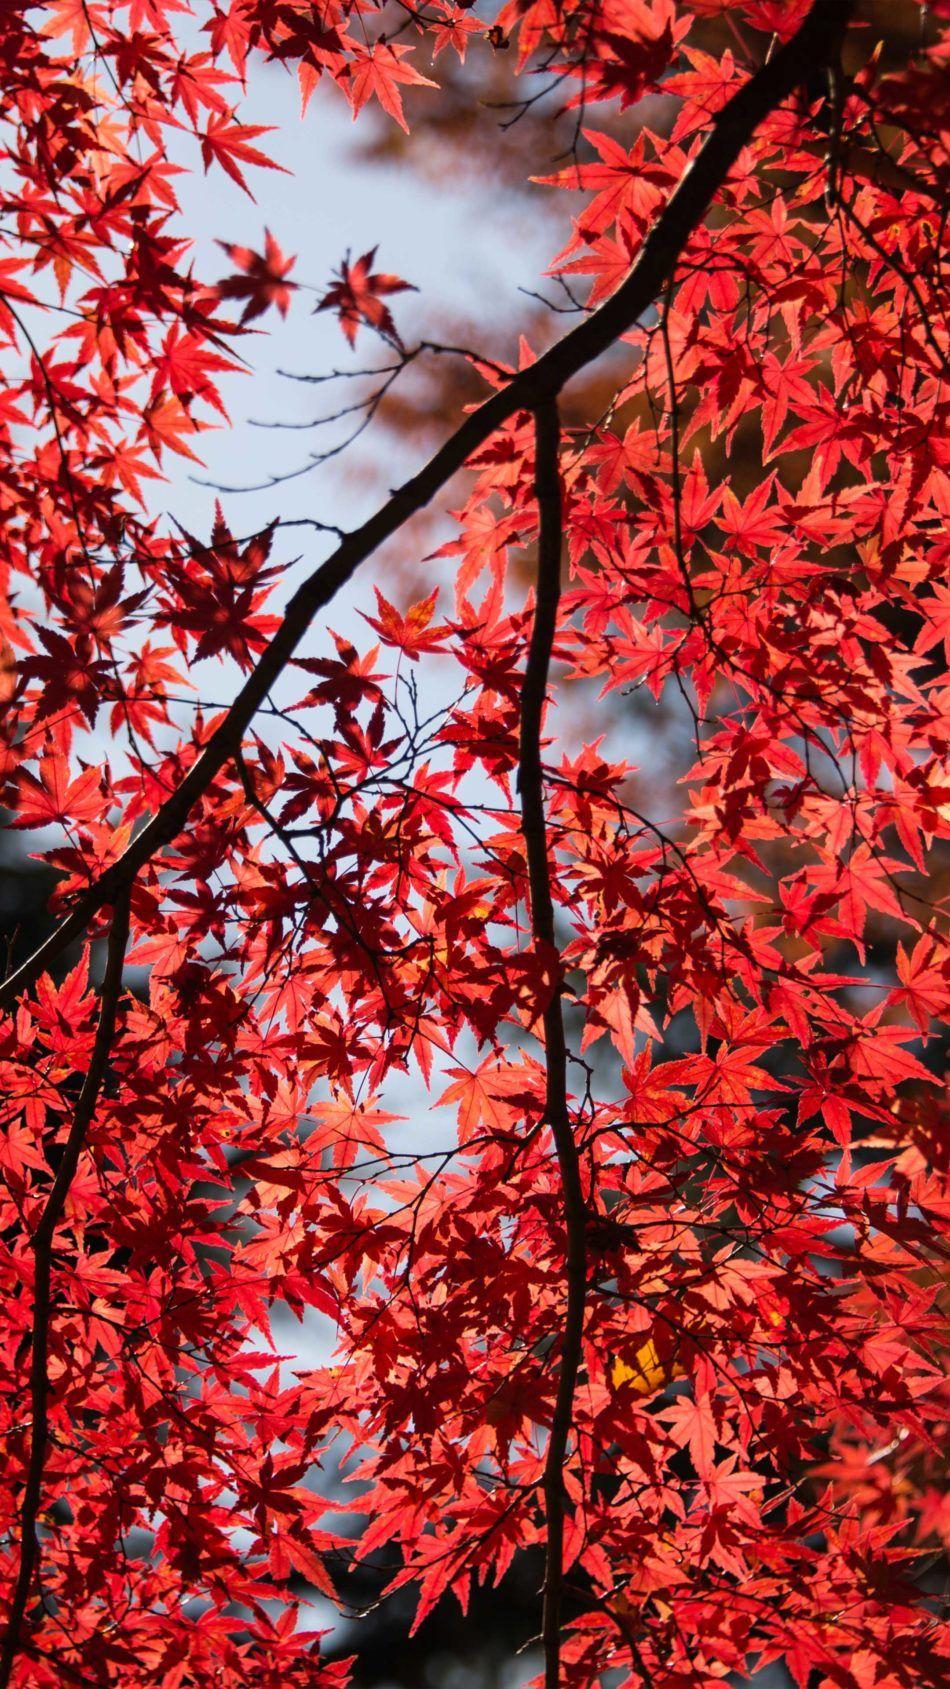 Red Maple Tree Leaves 4k Ultra Hd Mobile Wallpaper Red Maple Tree Red Maple Tree Leaf Red And Black Wallpaper